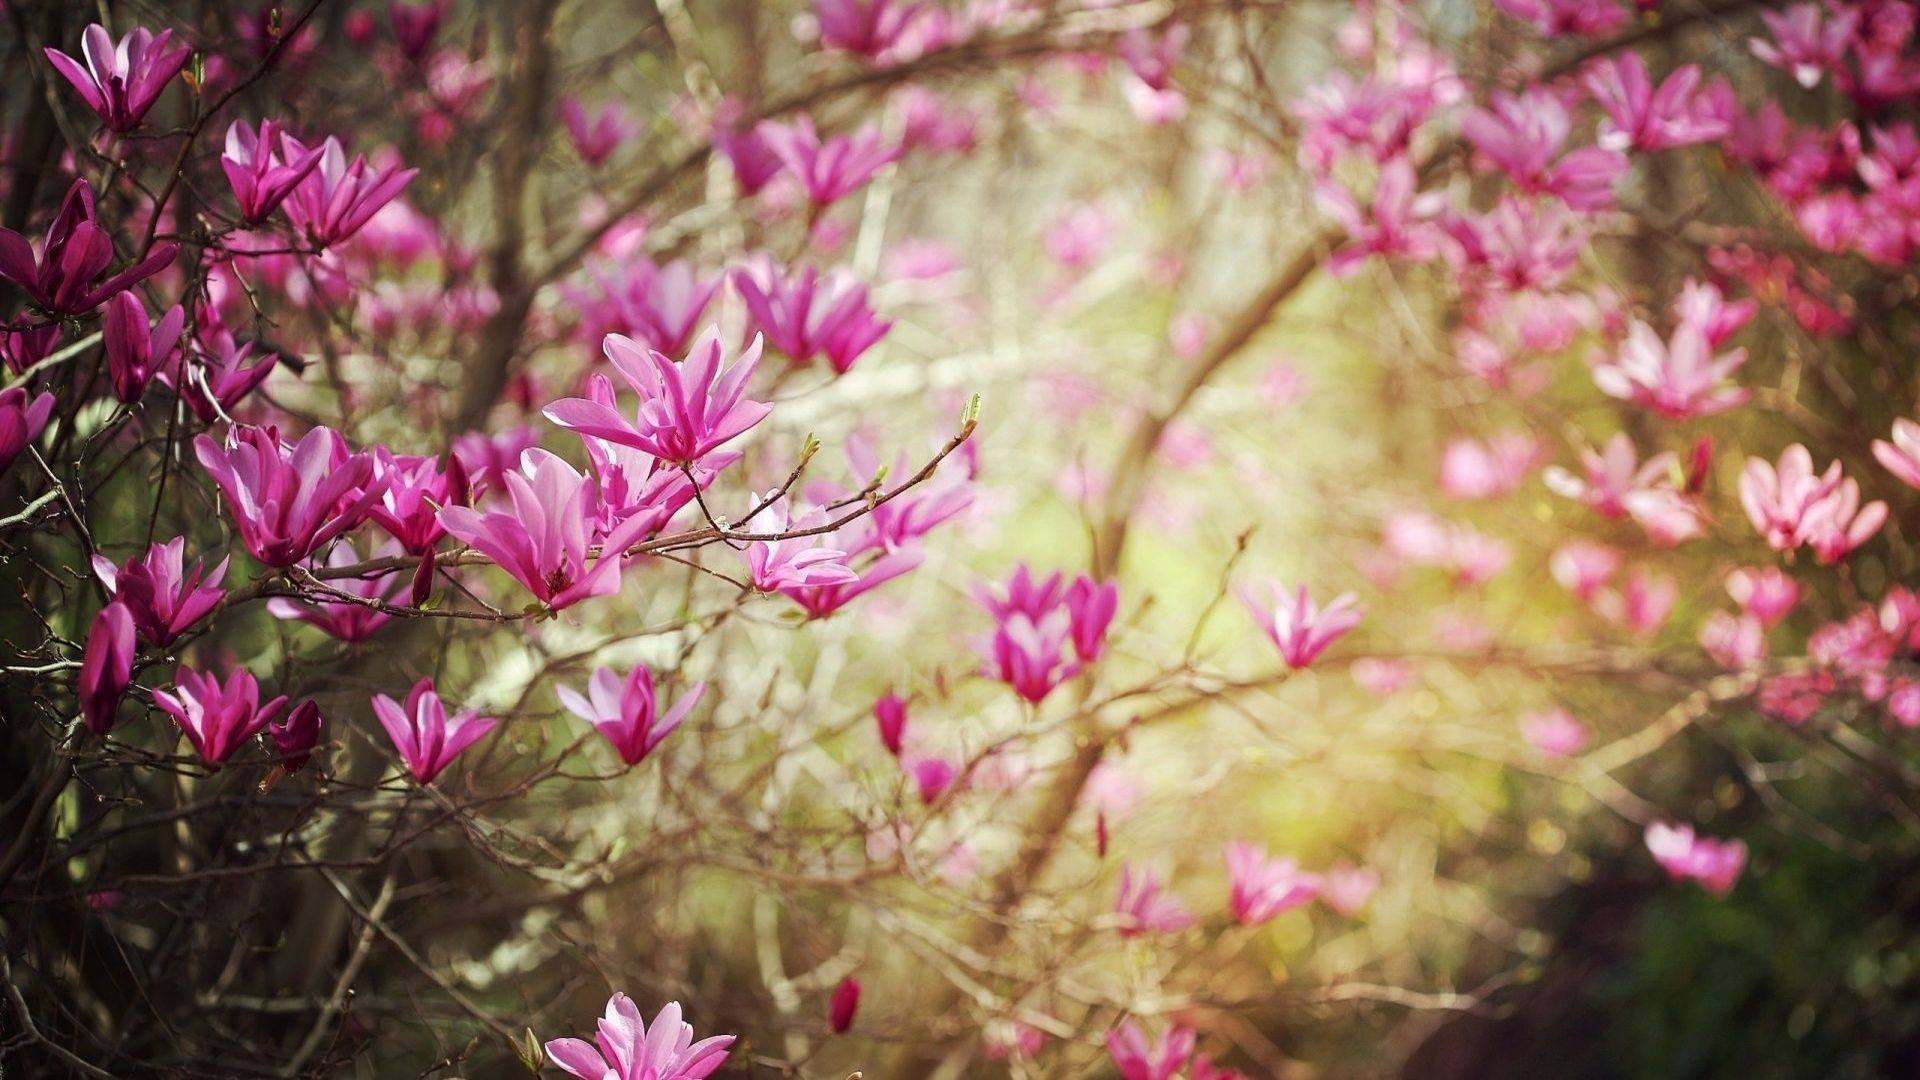 Garten Hd Fotos Herunterladen Quikeloga Ga